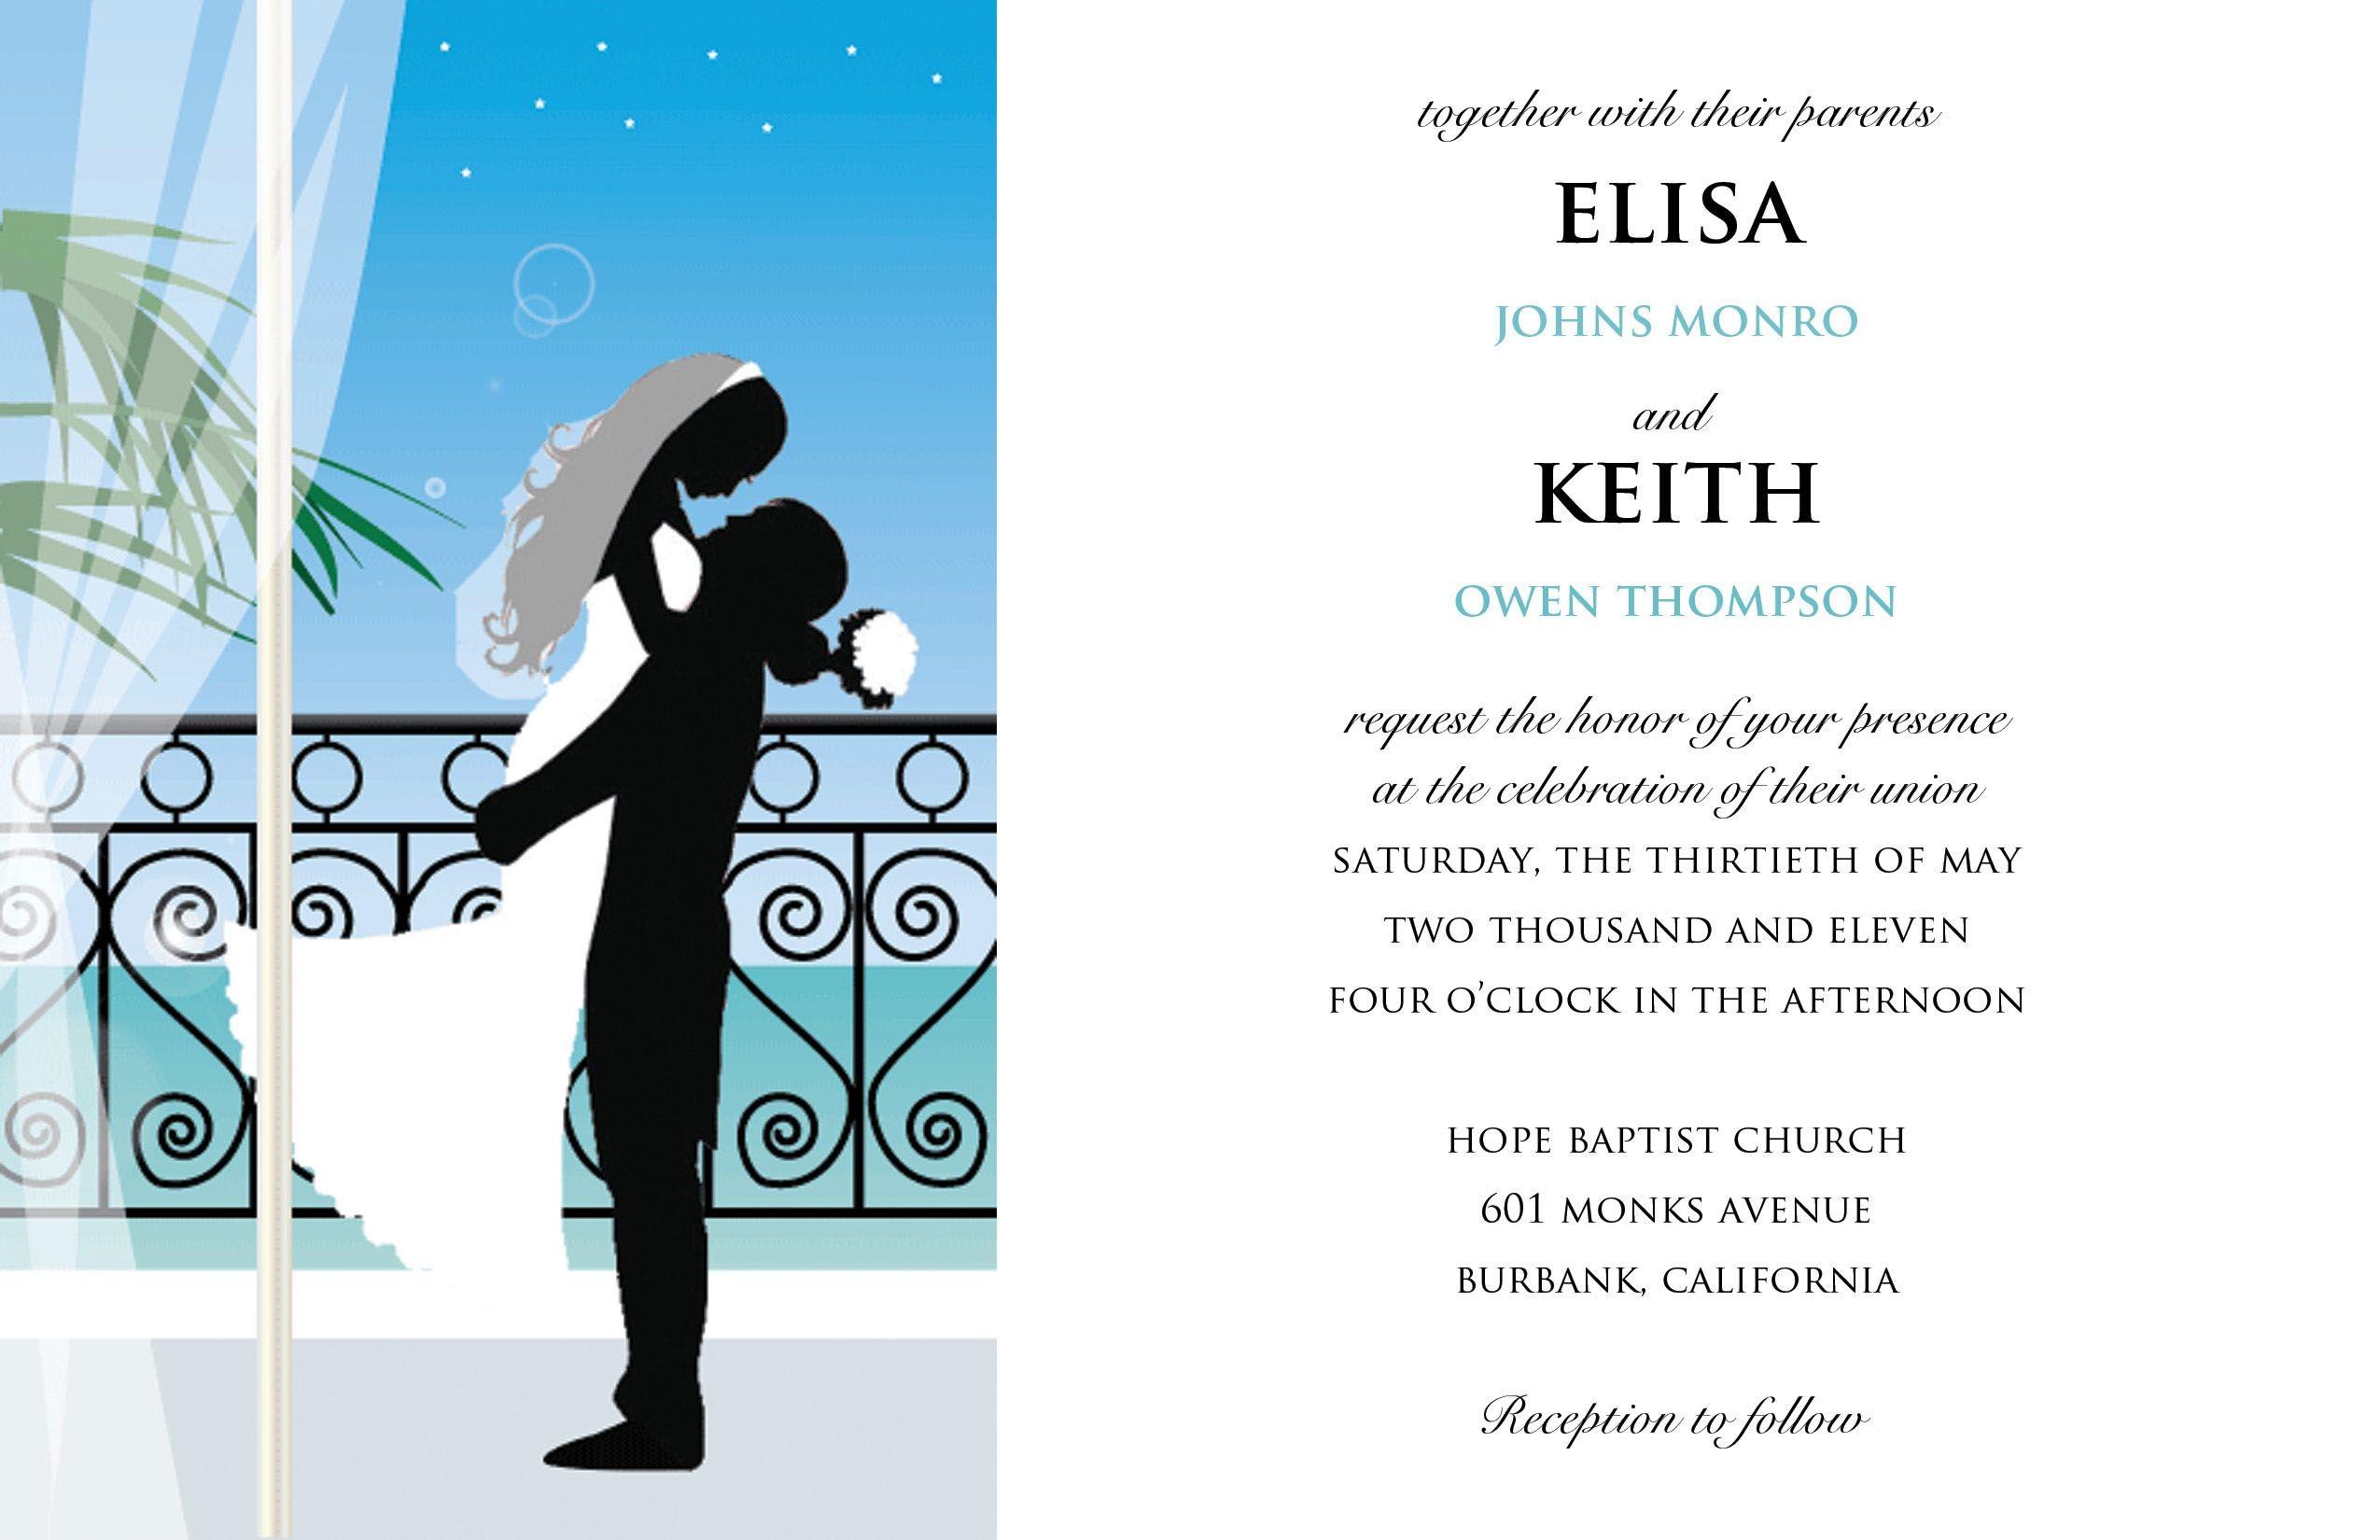 Wedding Invitation Cards Sample Wedding Invitation Card Sample ...